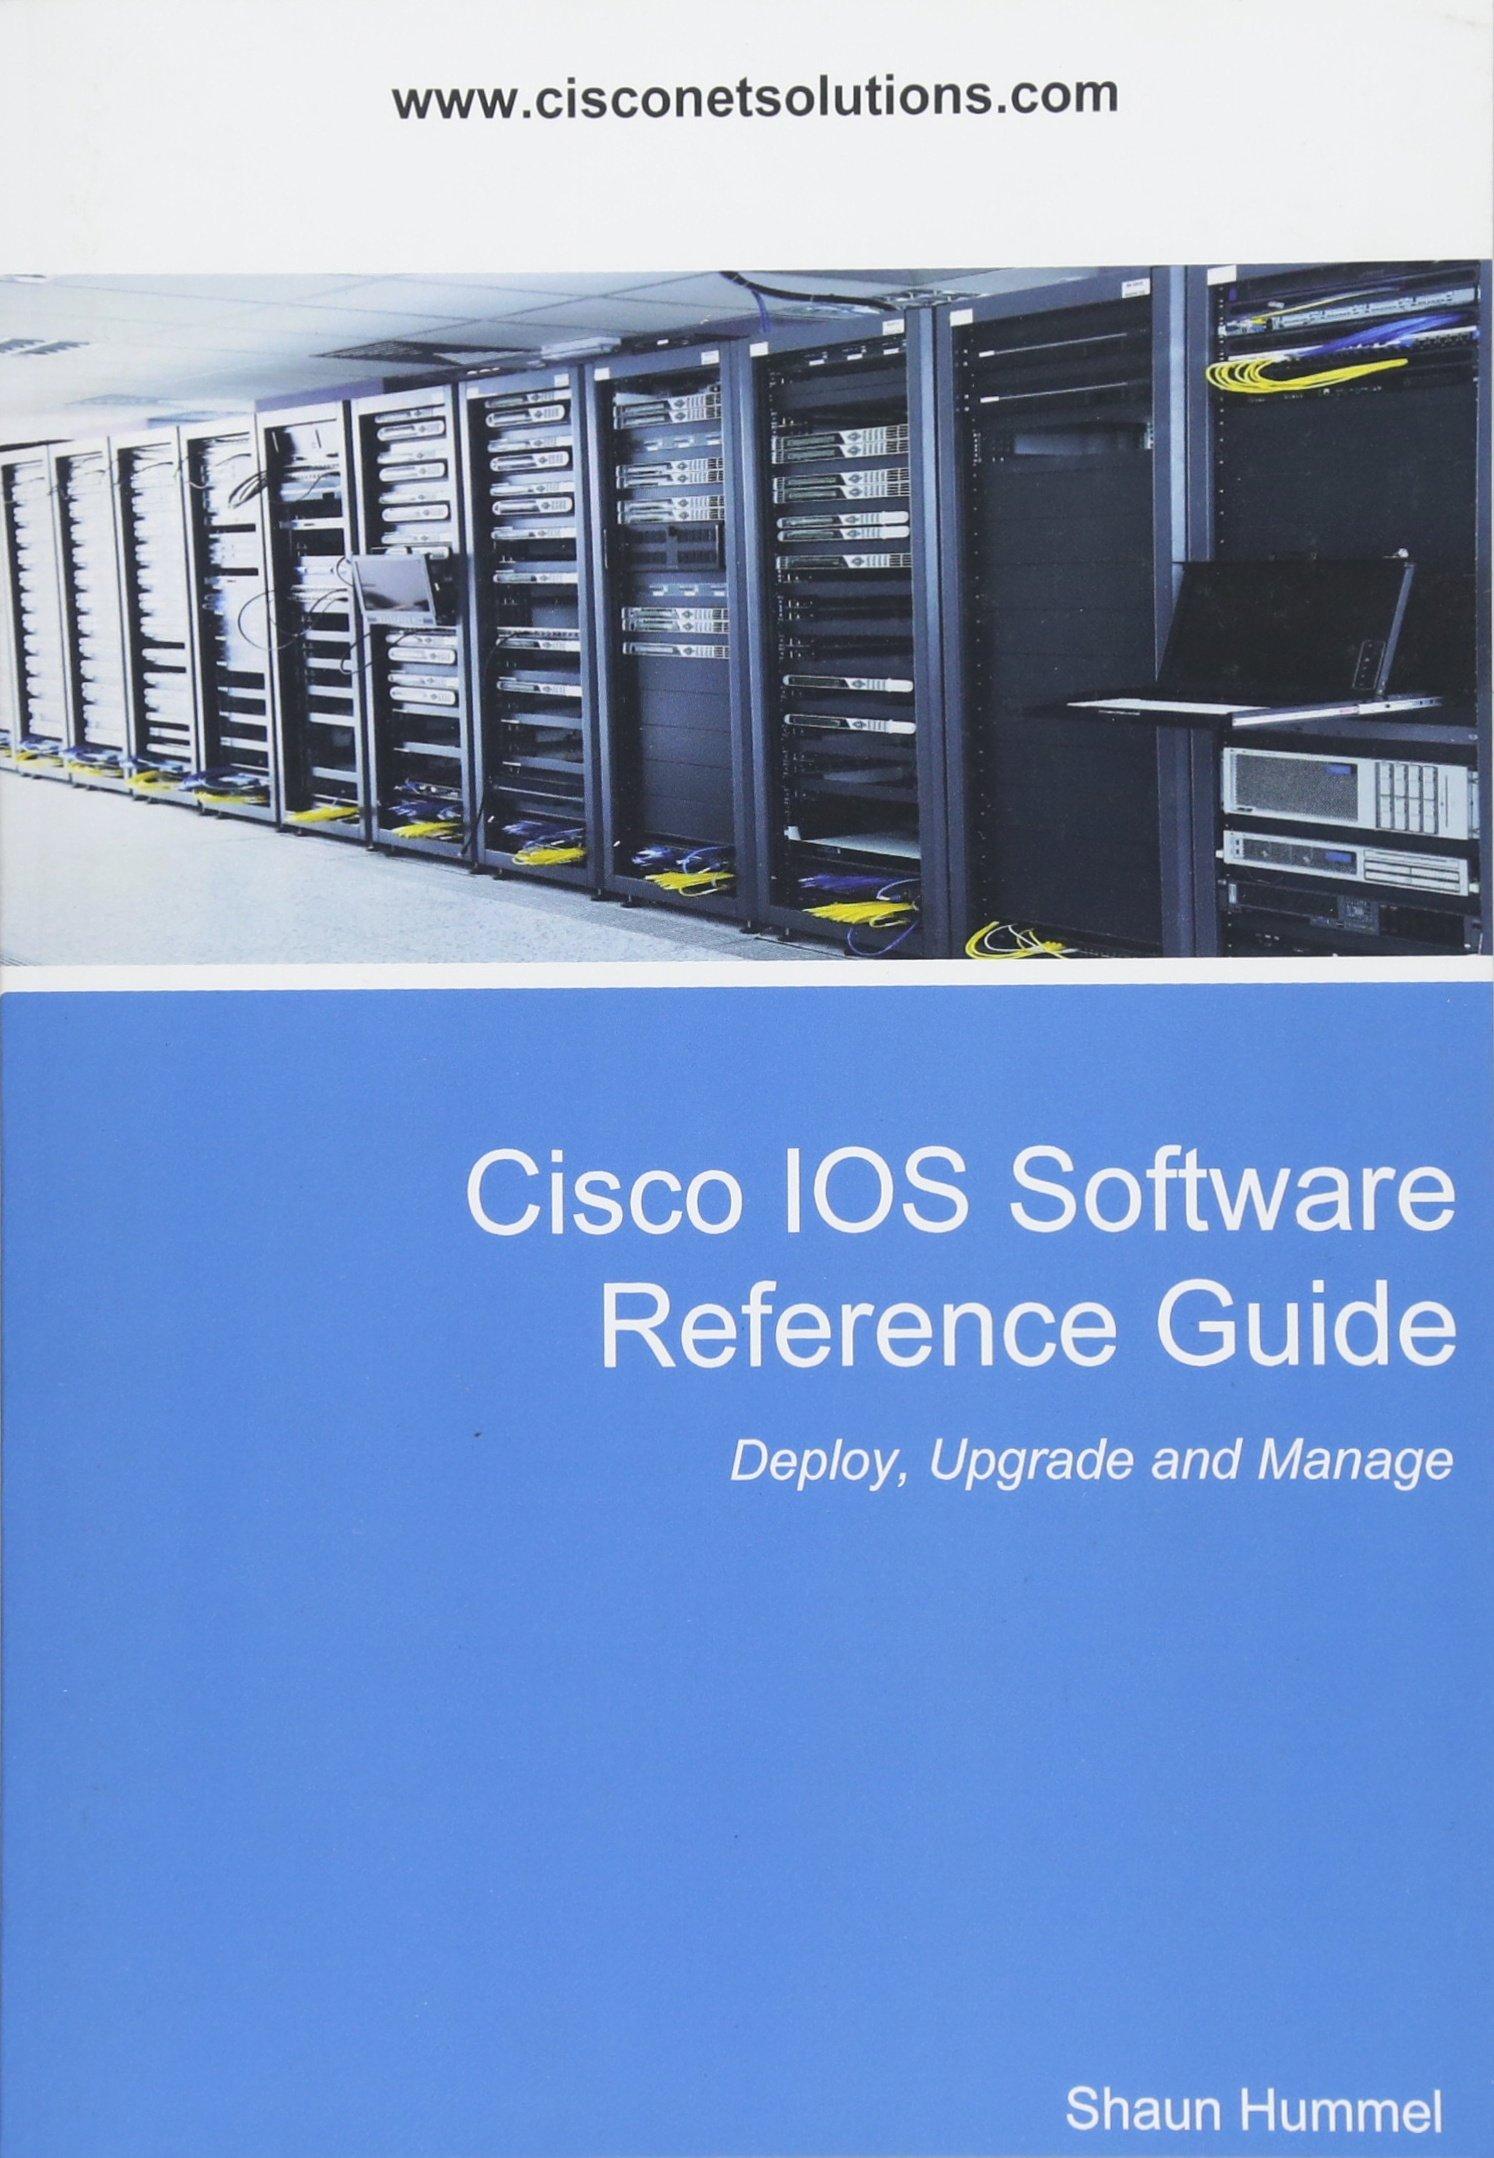 Download Cisco IOS Software Reference Guide: Install, Upgrade and  Configure IOS Software (Design) pdf epub